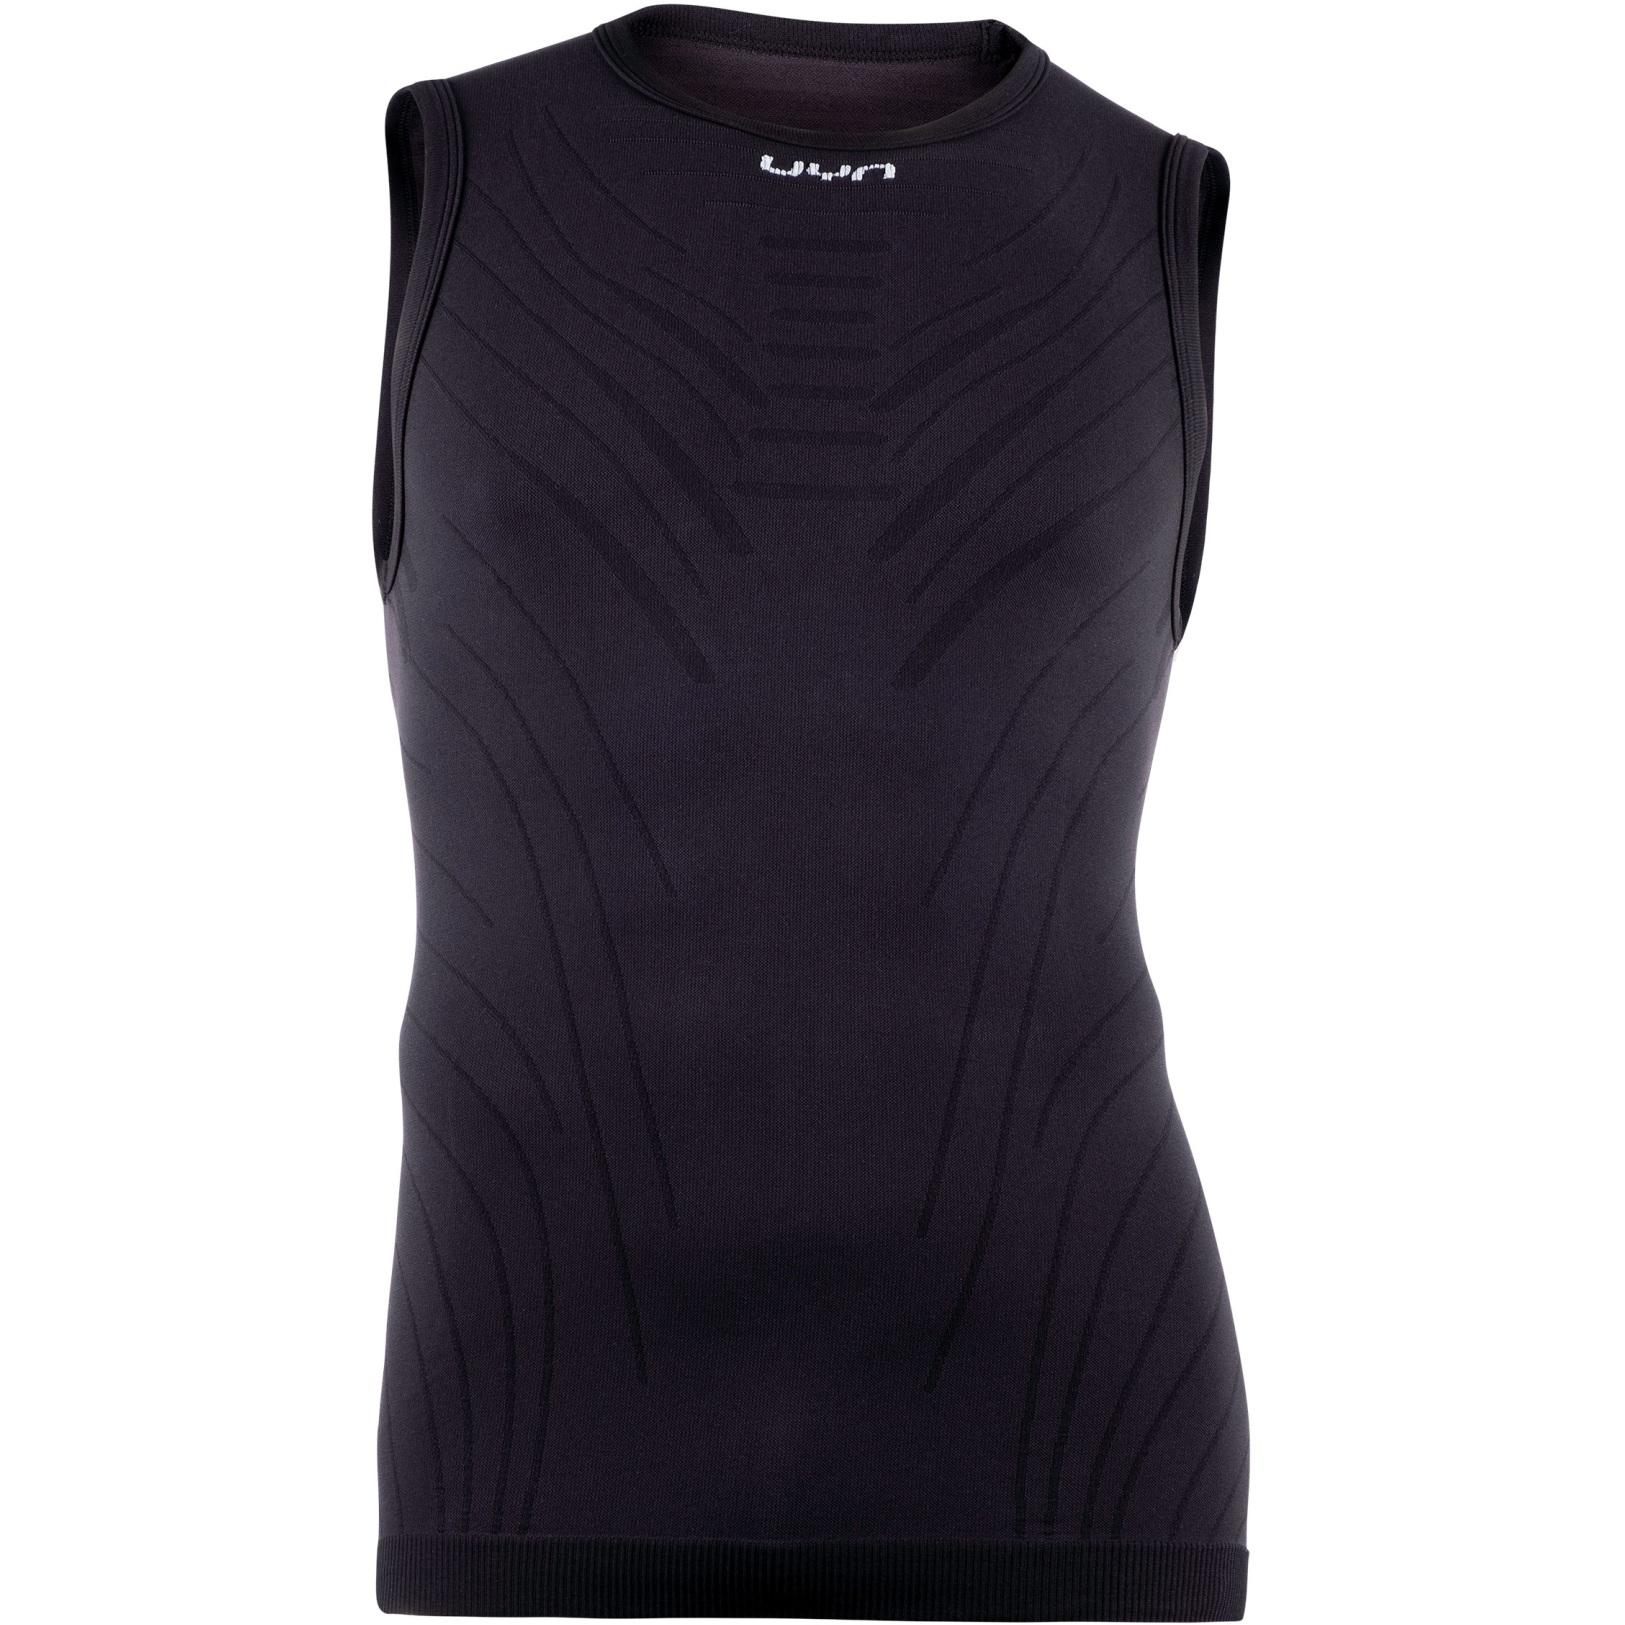 UYN Motyon 2.0 Sleeveless Undershirt - Blackboard